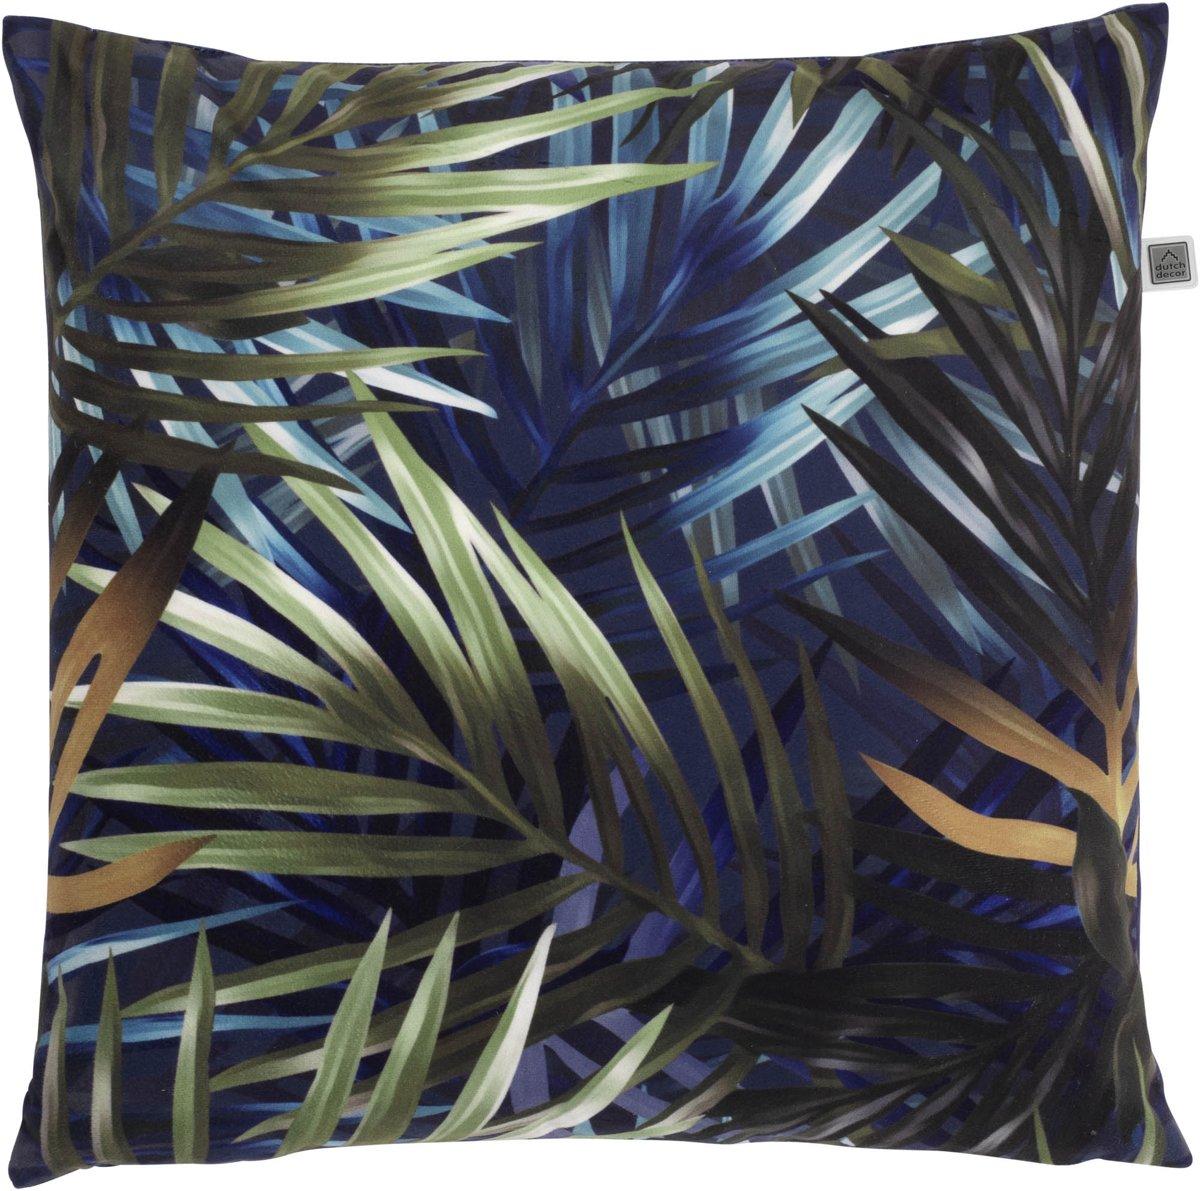 Dutch Decor Sierkussen Floris 70x70 cm blauw multi kopen